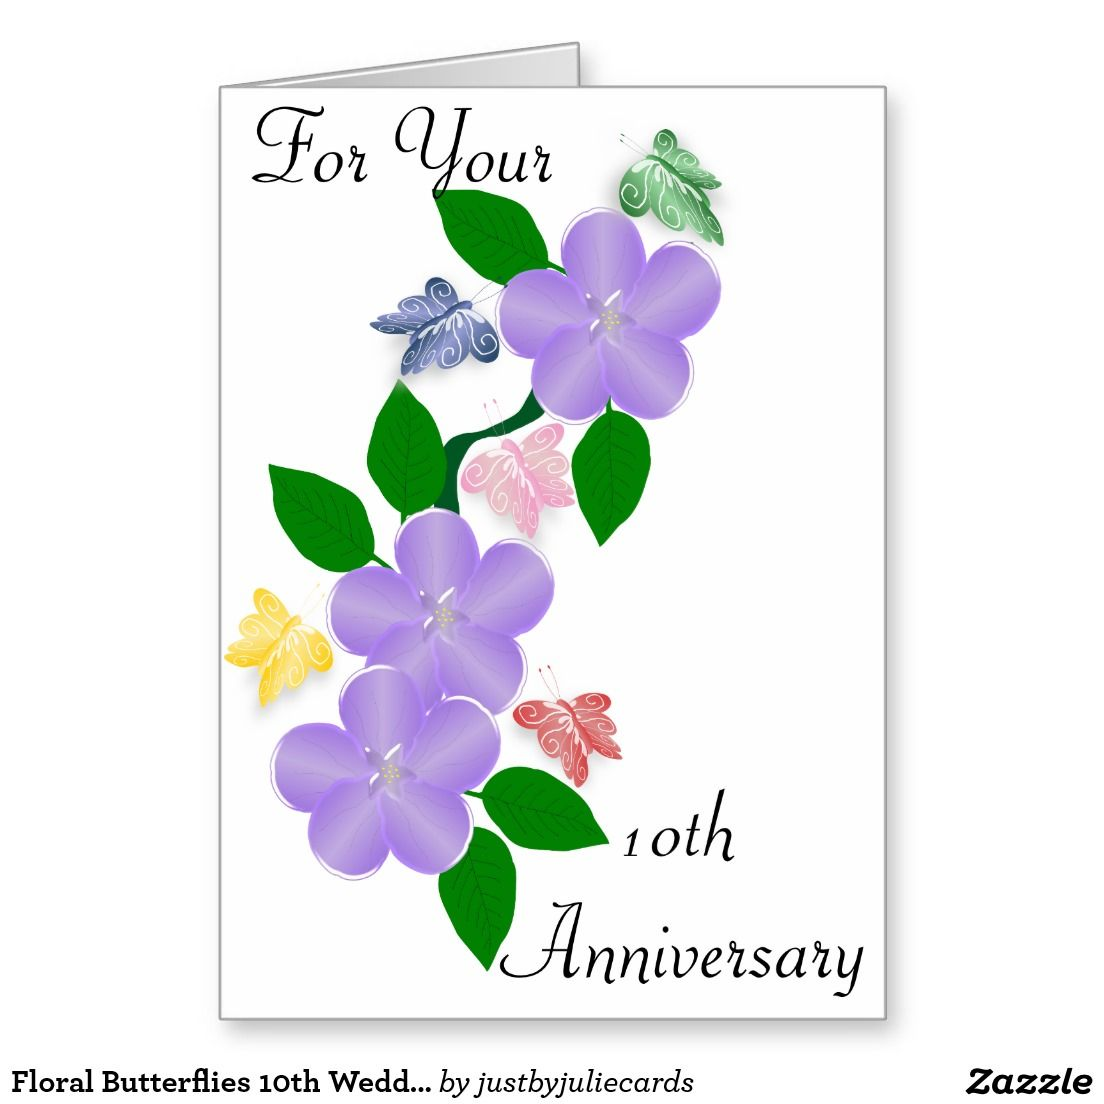 Floral Butterflies 10th Wedding Anniversary Card Pinterest 10th